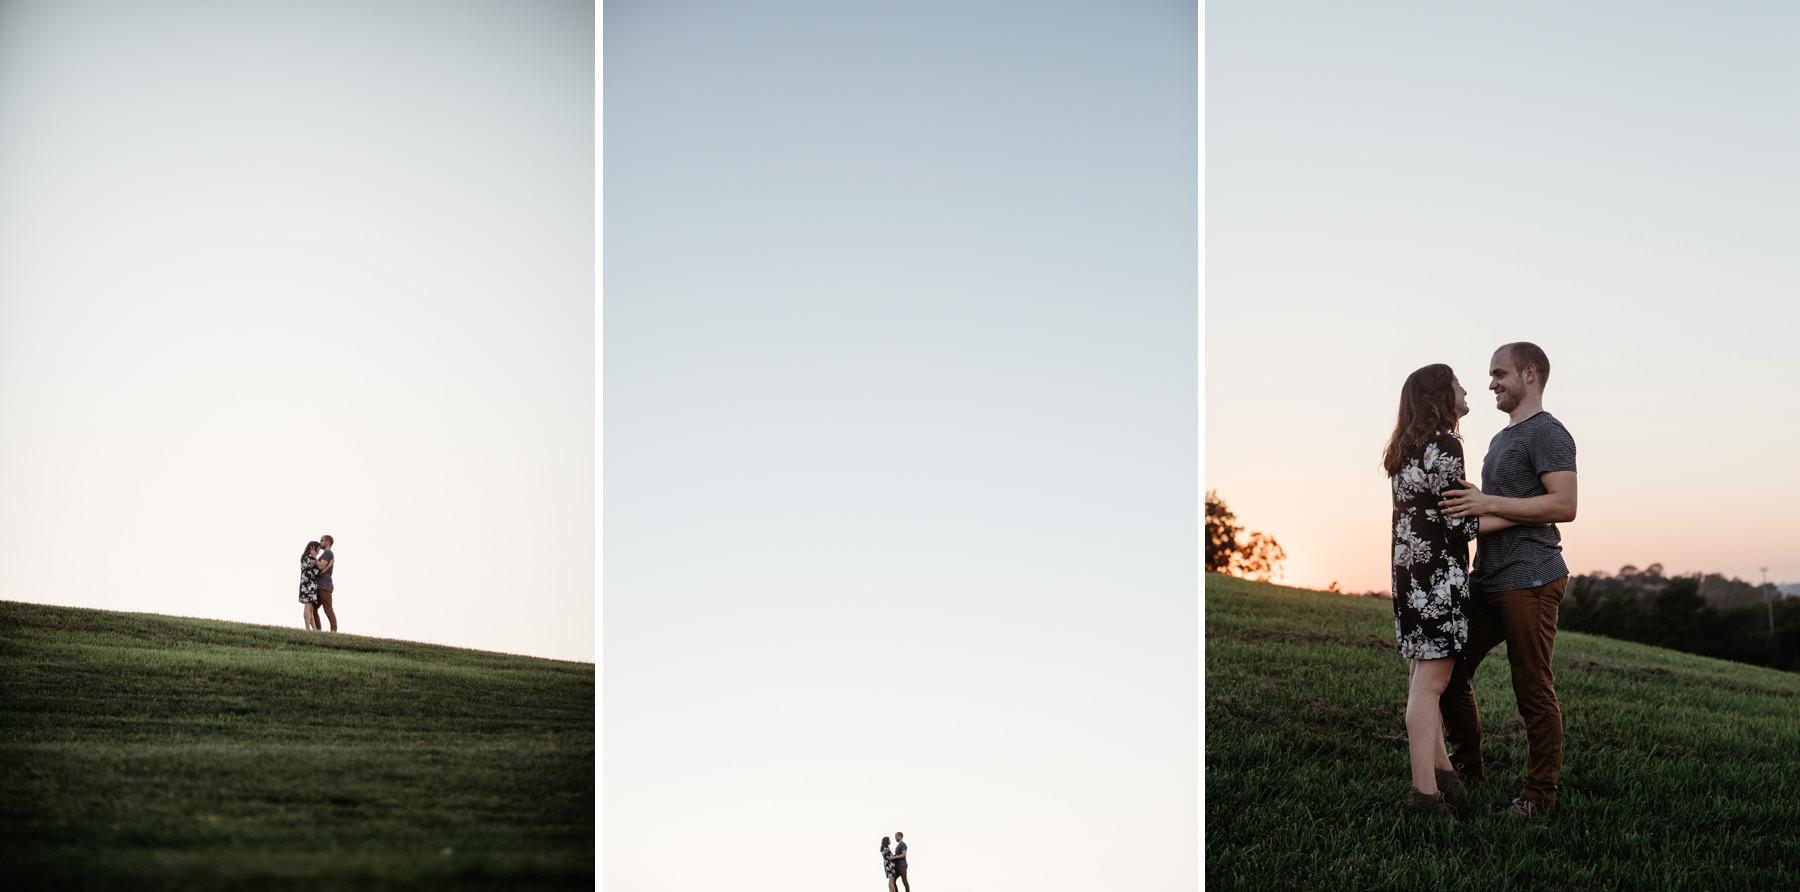 Kansas City_Penn Valley Park_Engagement Session_Kindling Wedding Photography46.JPG